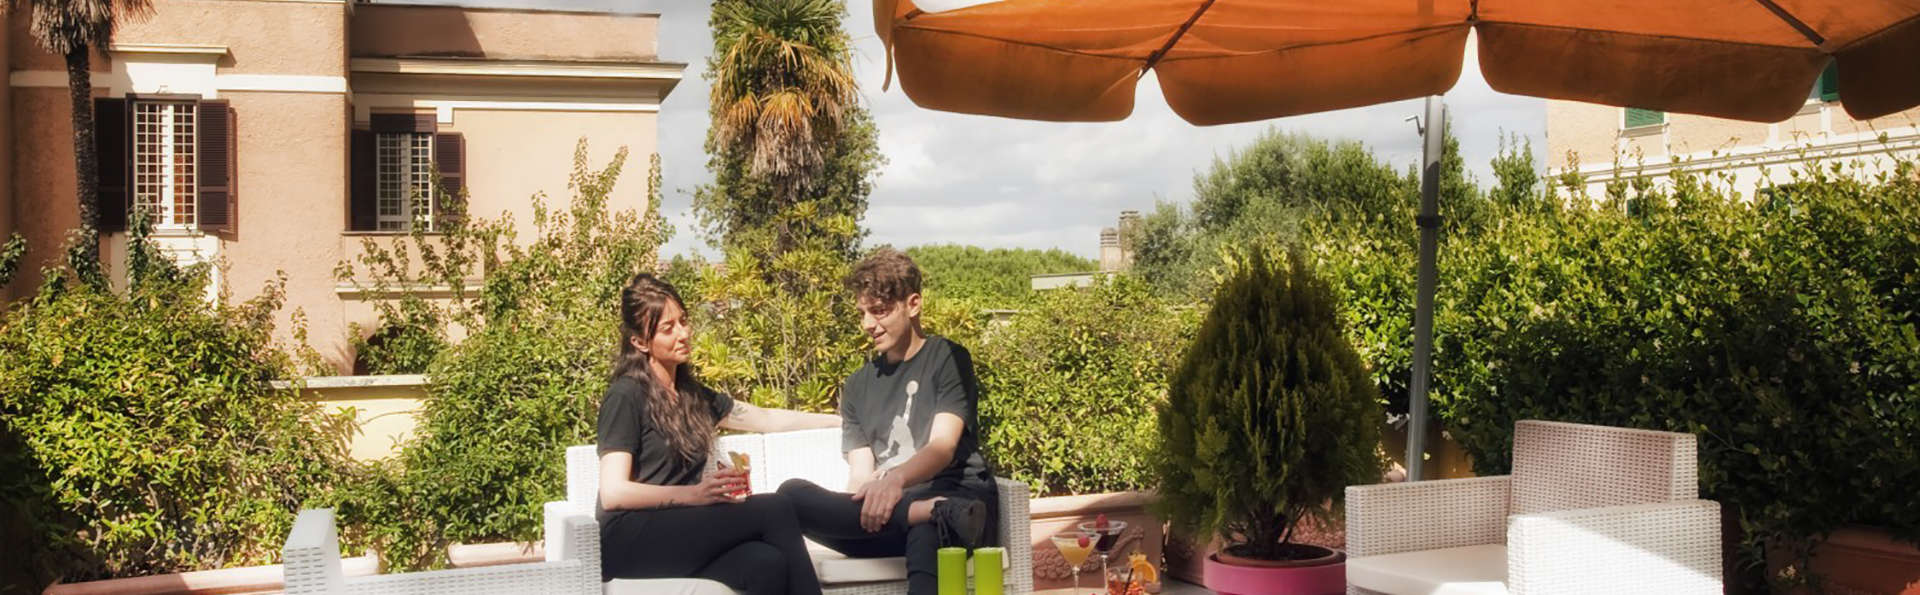 Best Western Ars Hotel Roma - Edit_Terrace.jpg